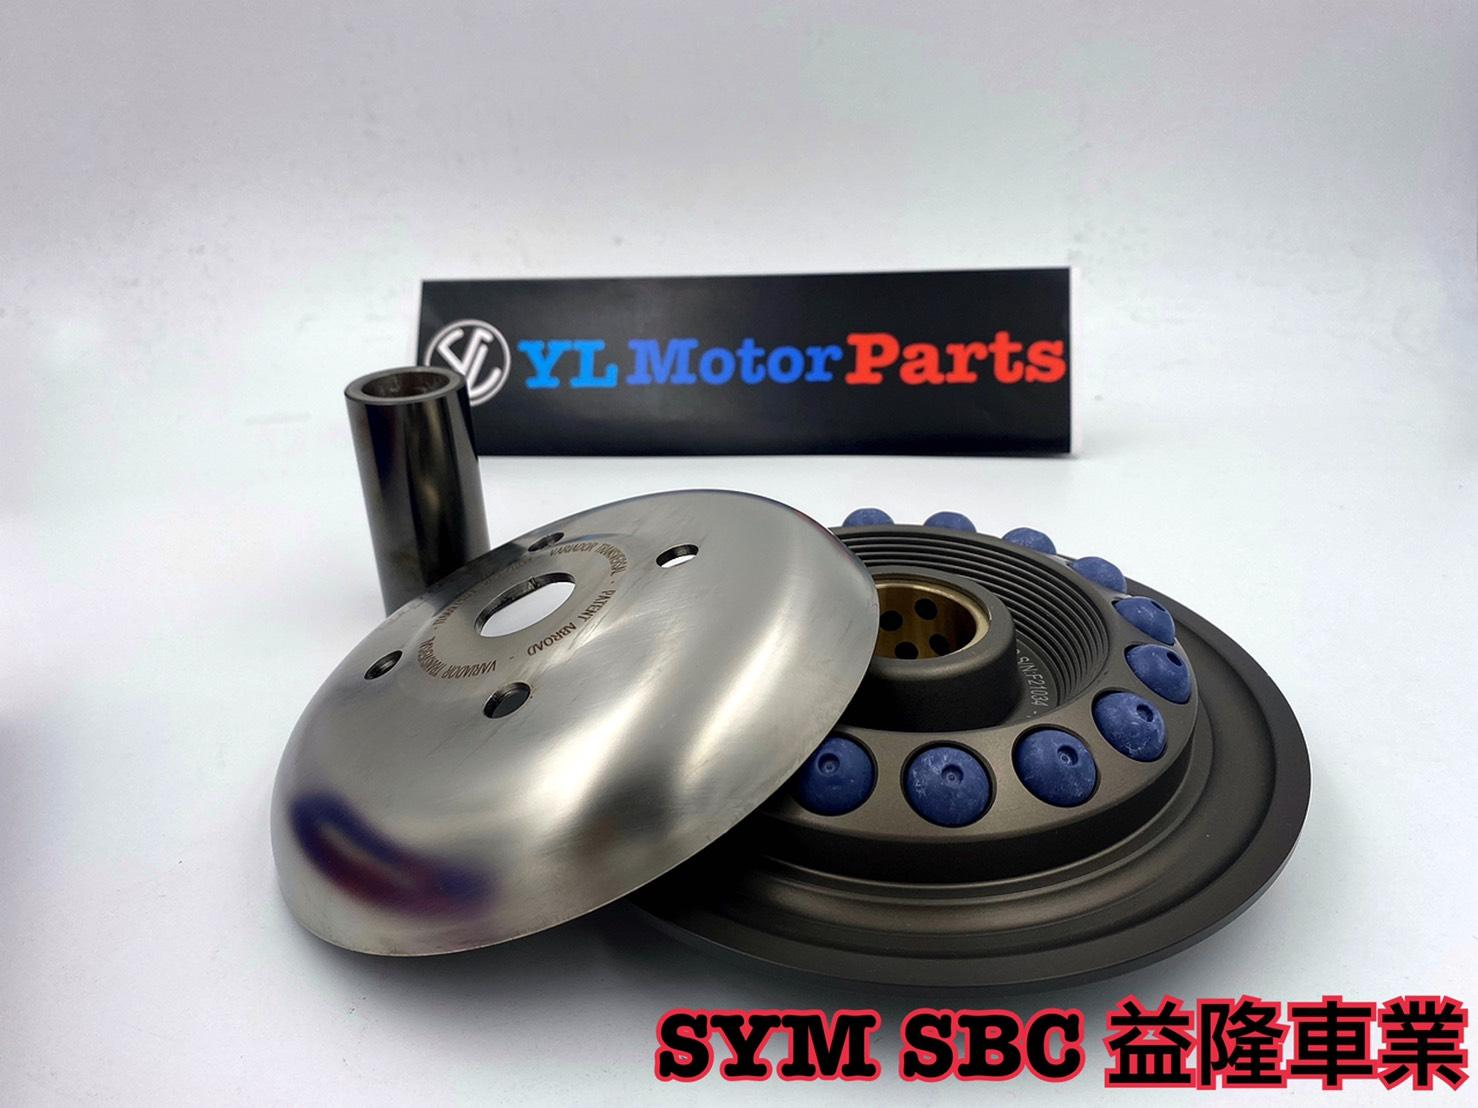 MAXSYM TL 500 專用 飛碟盤*SYM SBC 益隆車業*